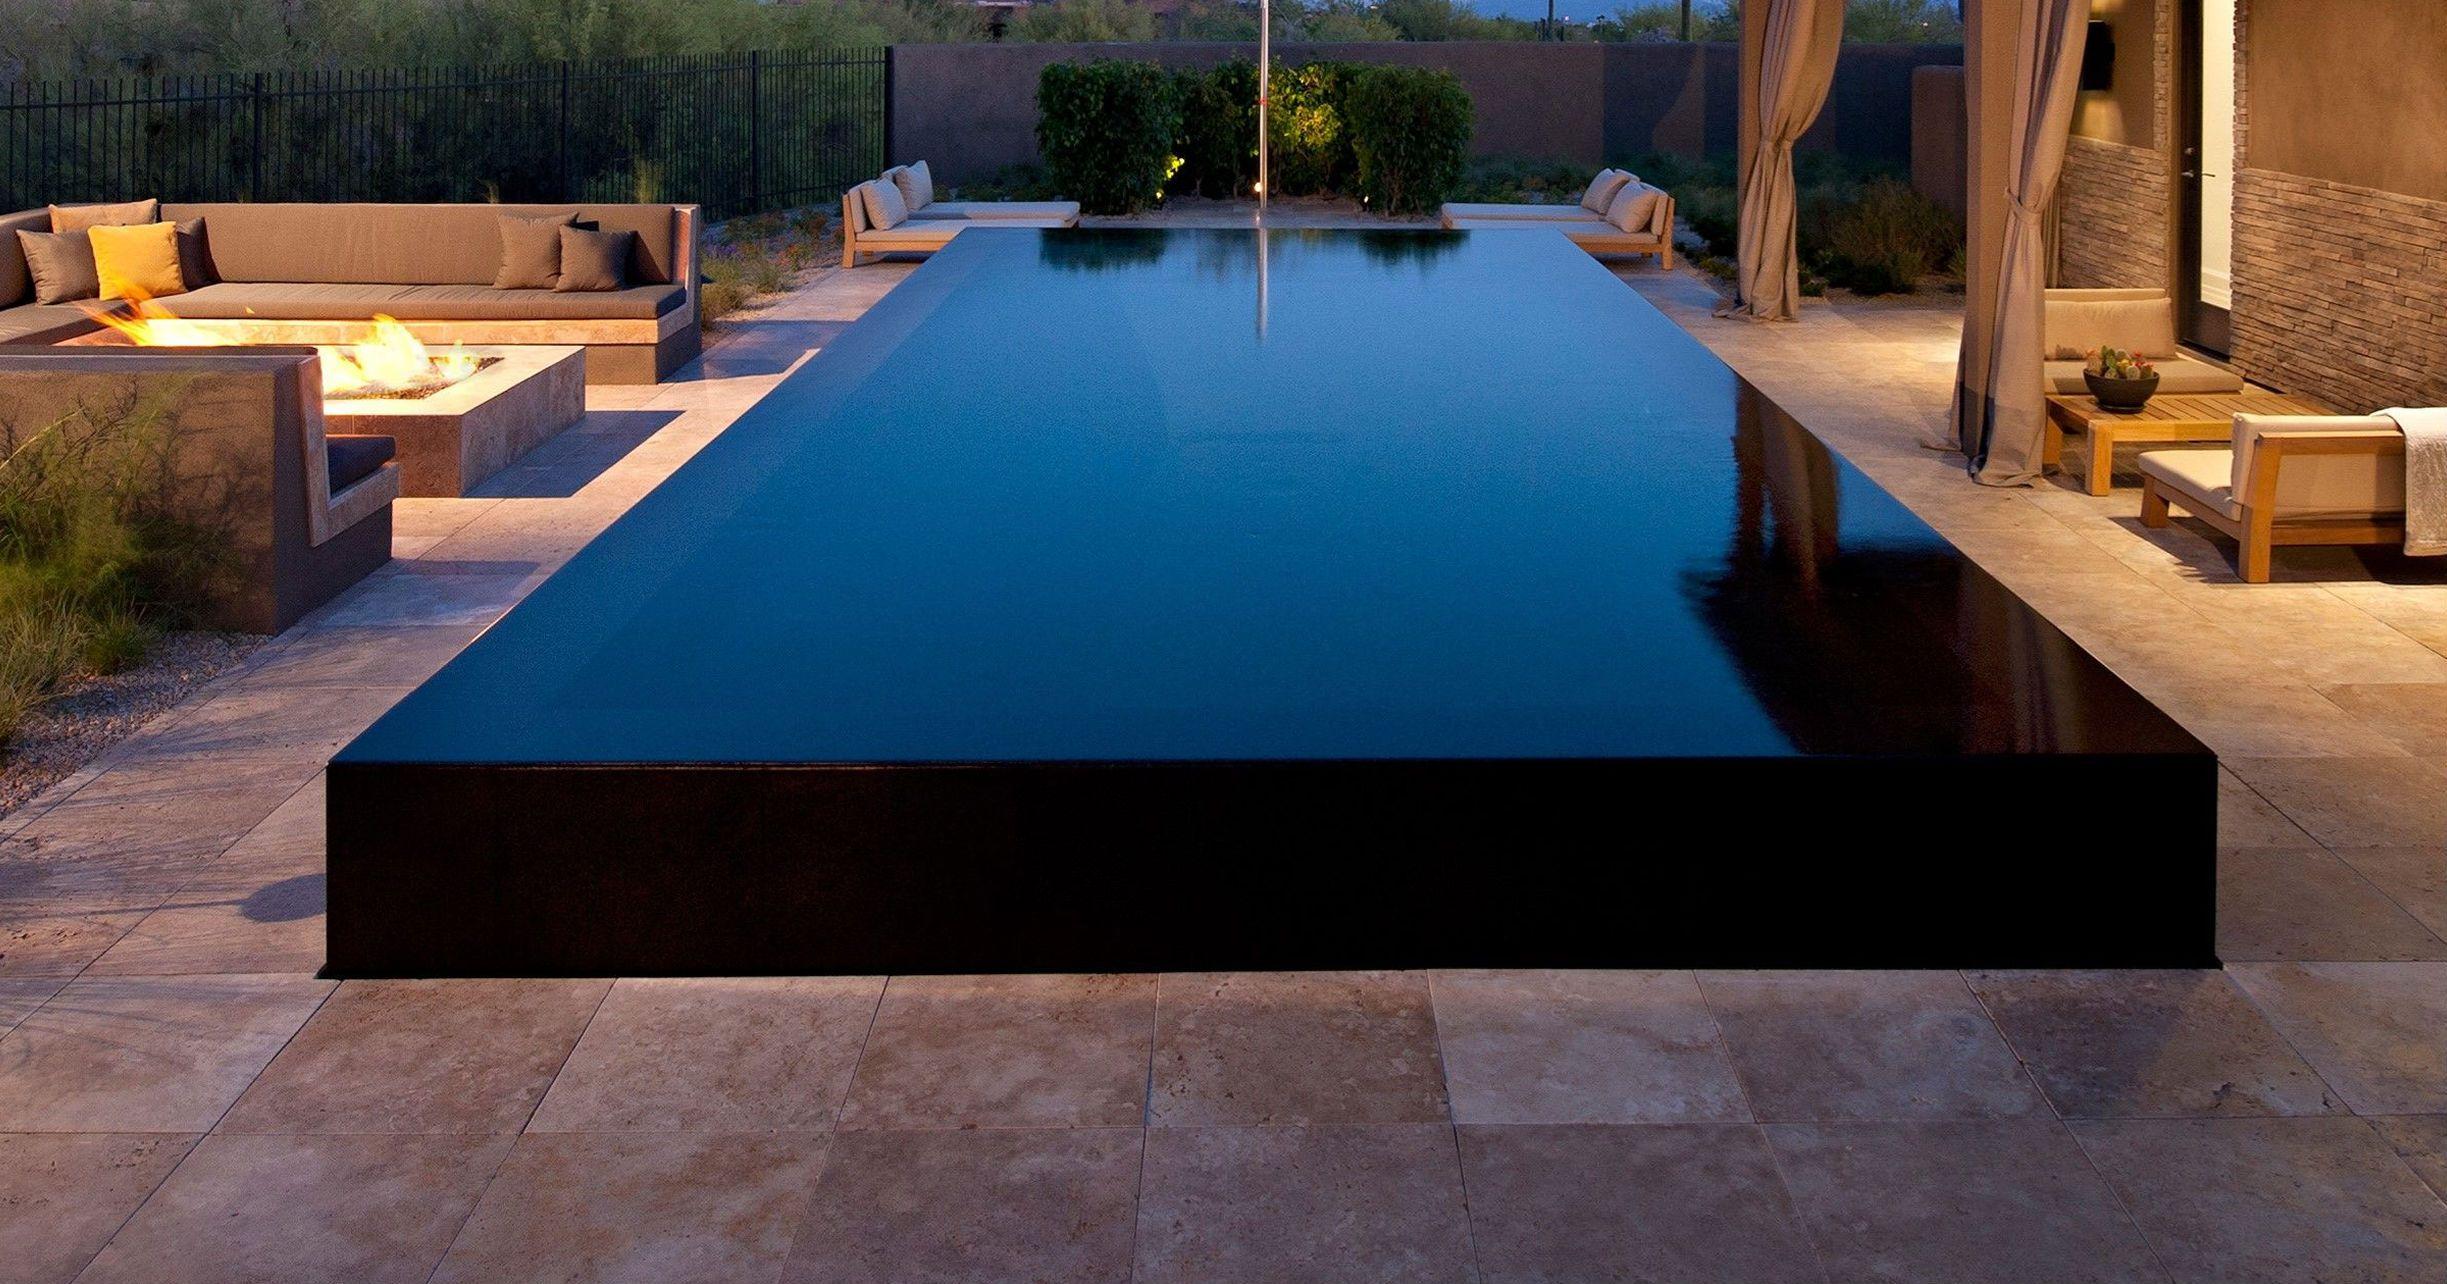 Mirror Pool Concept | desertgrove.com | Entertainment Areas ...